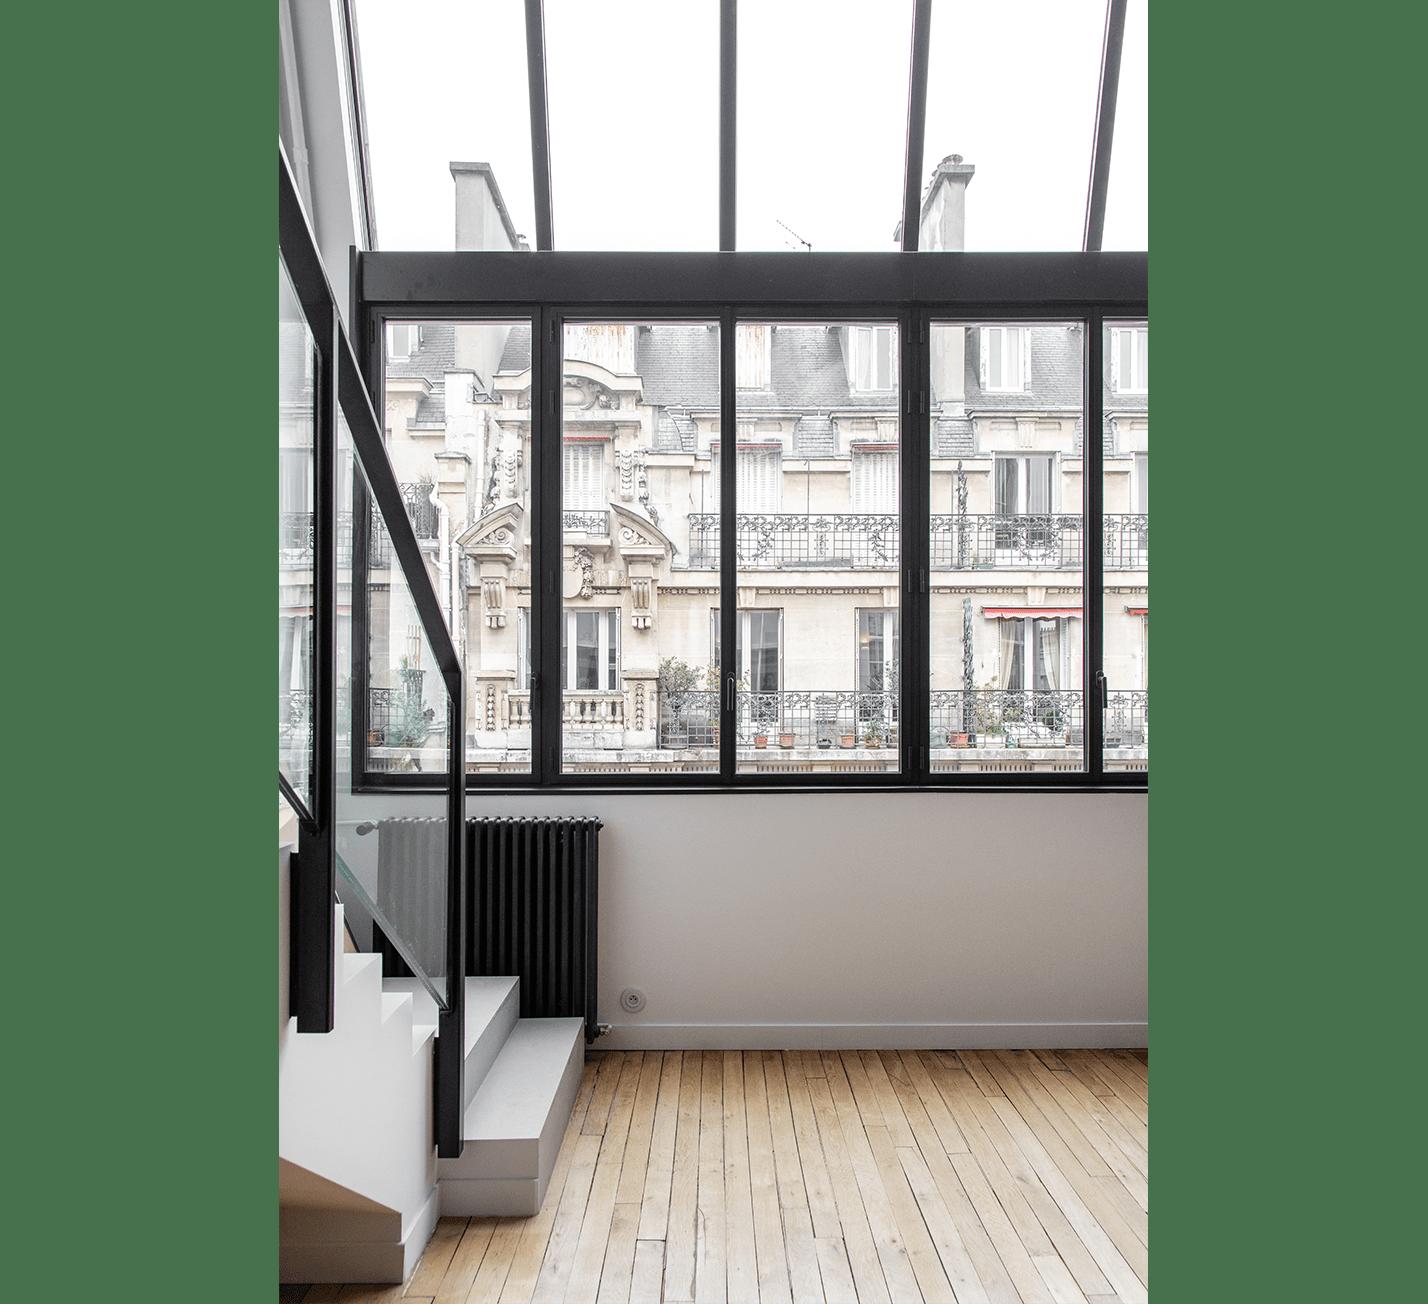 Projet-Senoch-Atelier-Steve-Pauline-Borgia-Architecte-interieur-12-min